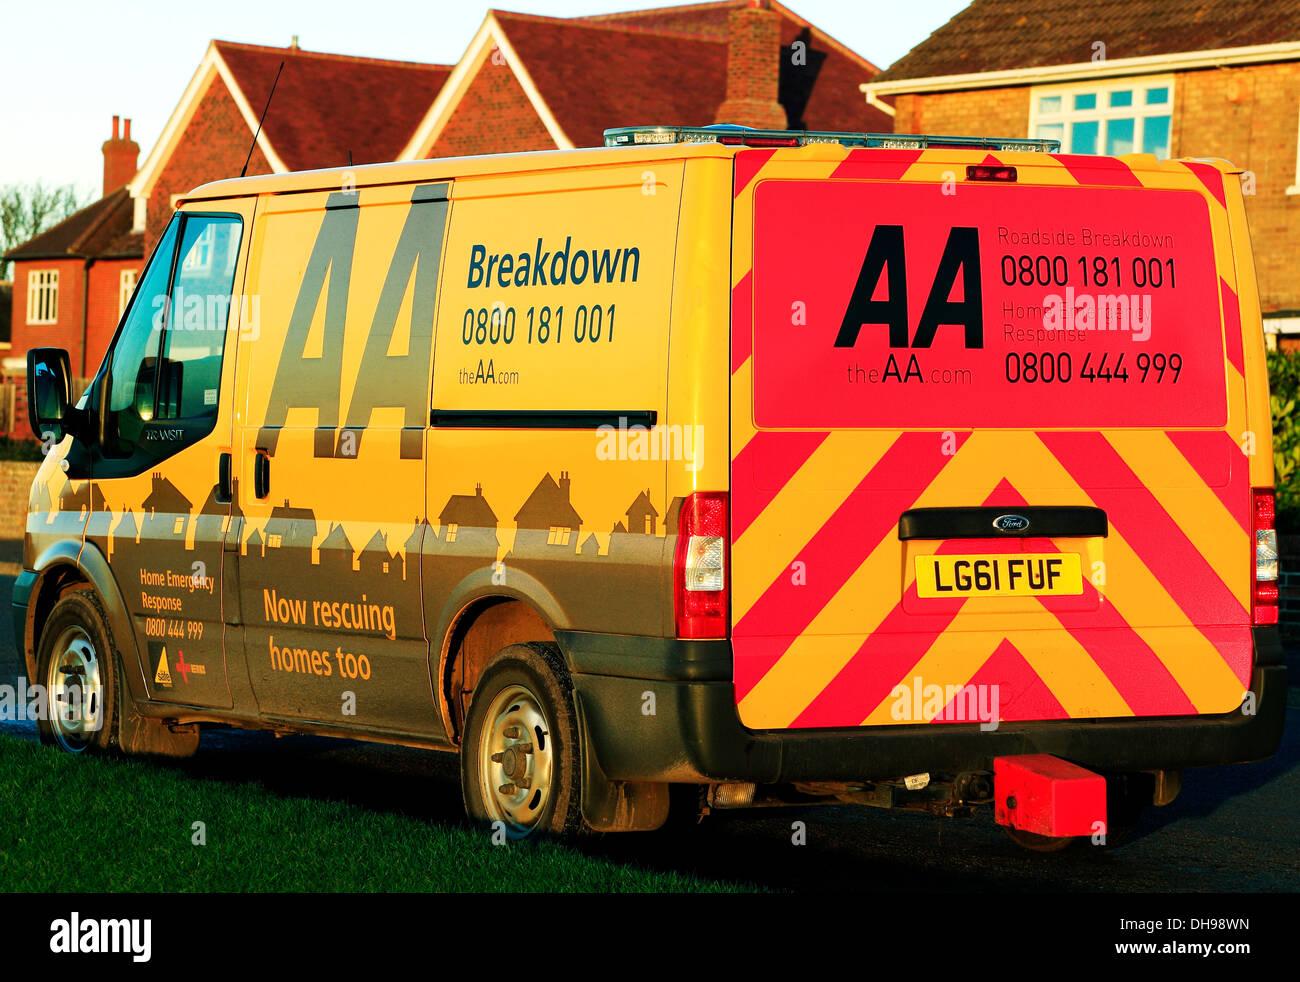 AA Ausfall Fahrzeug England UK, Heimat Einsatzfahrzeuge am Straßenrand Stockbild